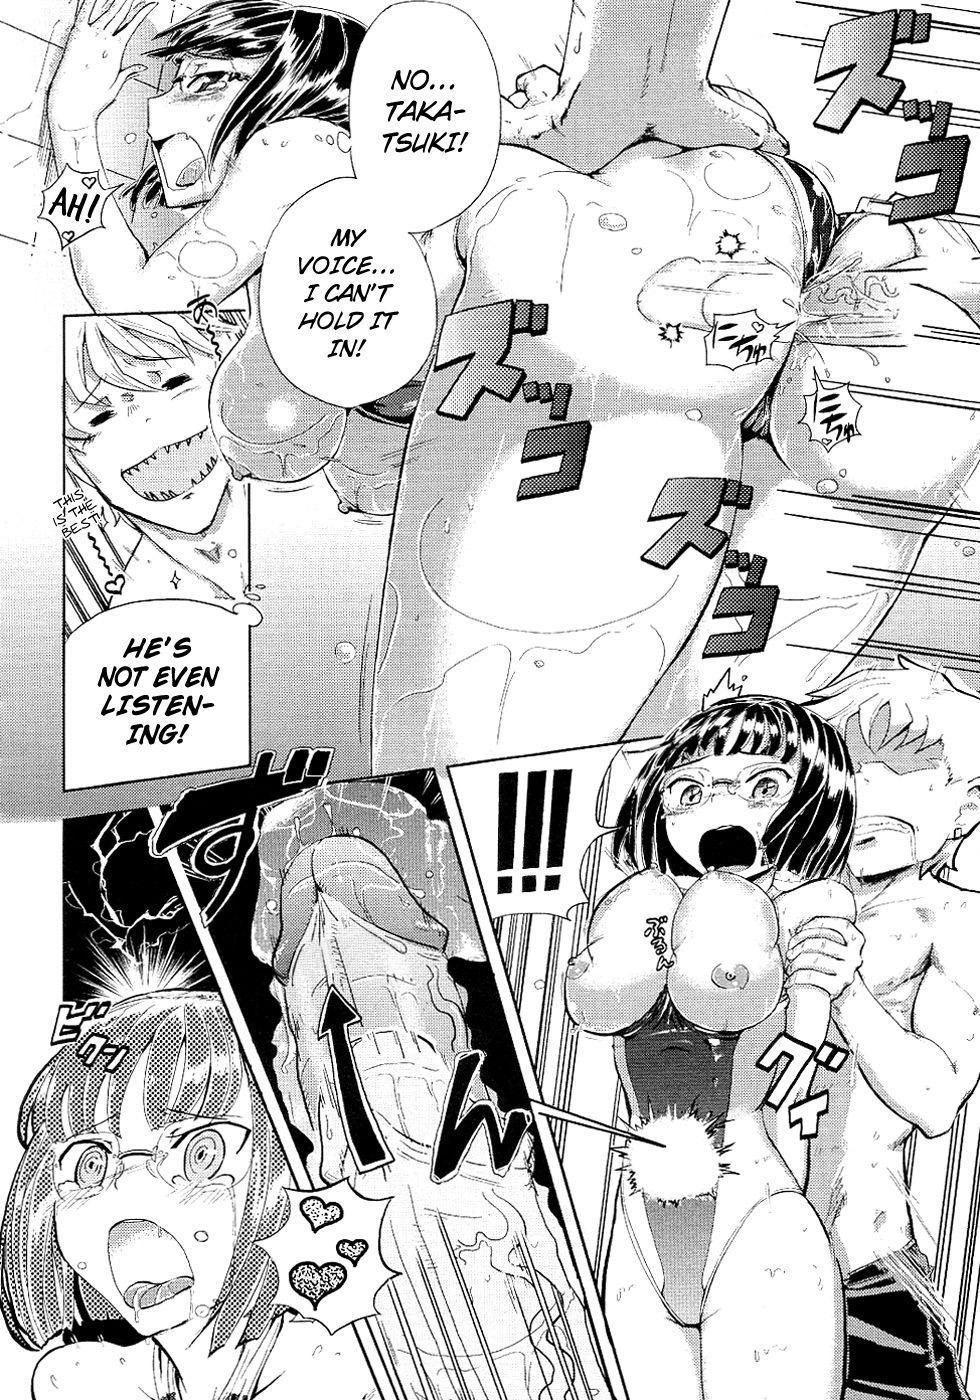 [Arasumi Shii] Back to the Iinchou (COMIC Megastore 2011-07) [English] ==Strange Companions== [Decensored] 17